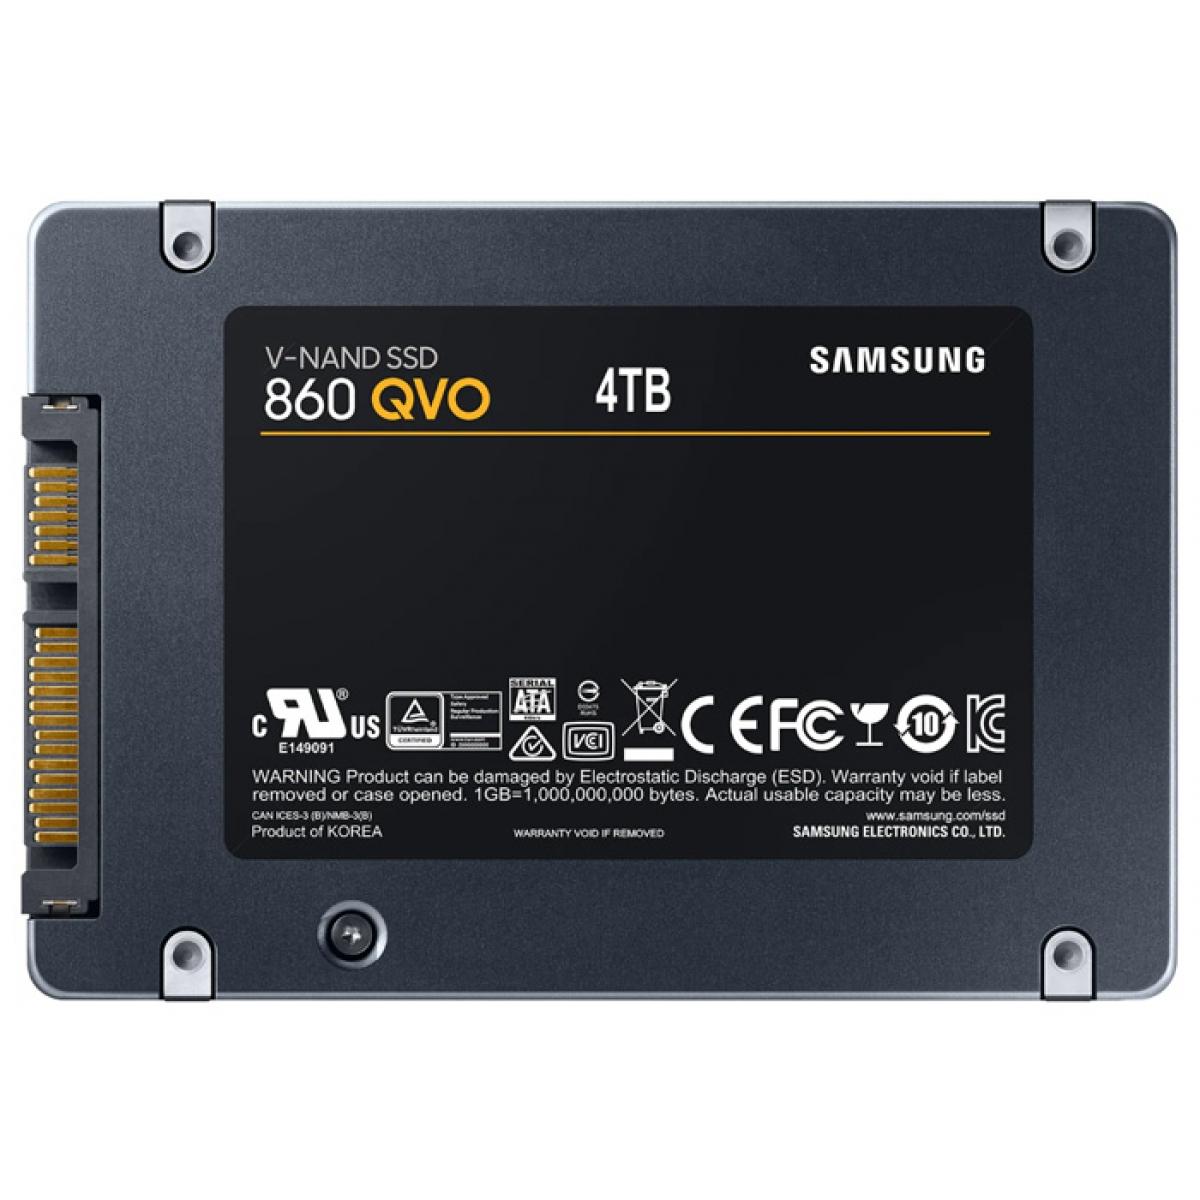 SSD Samsung 860 QVO, 4TB, Sata III, Leitura 550MBs e Gravação 520MBs, MZ-76Q4T0B/AM